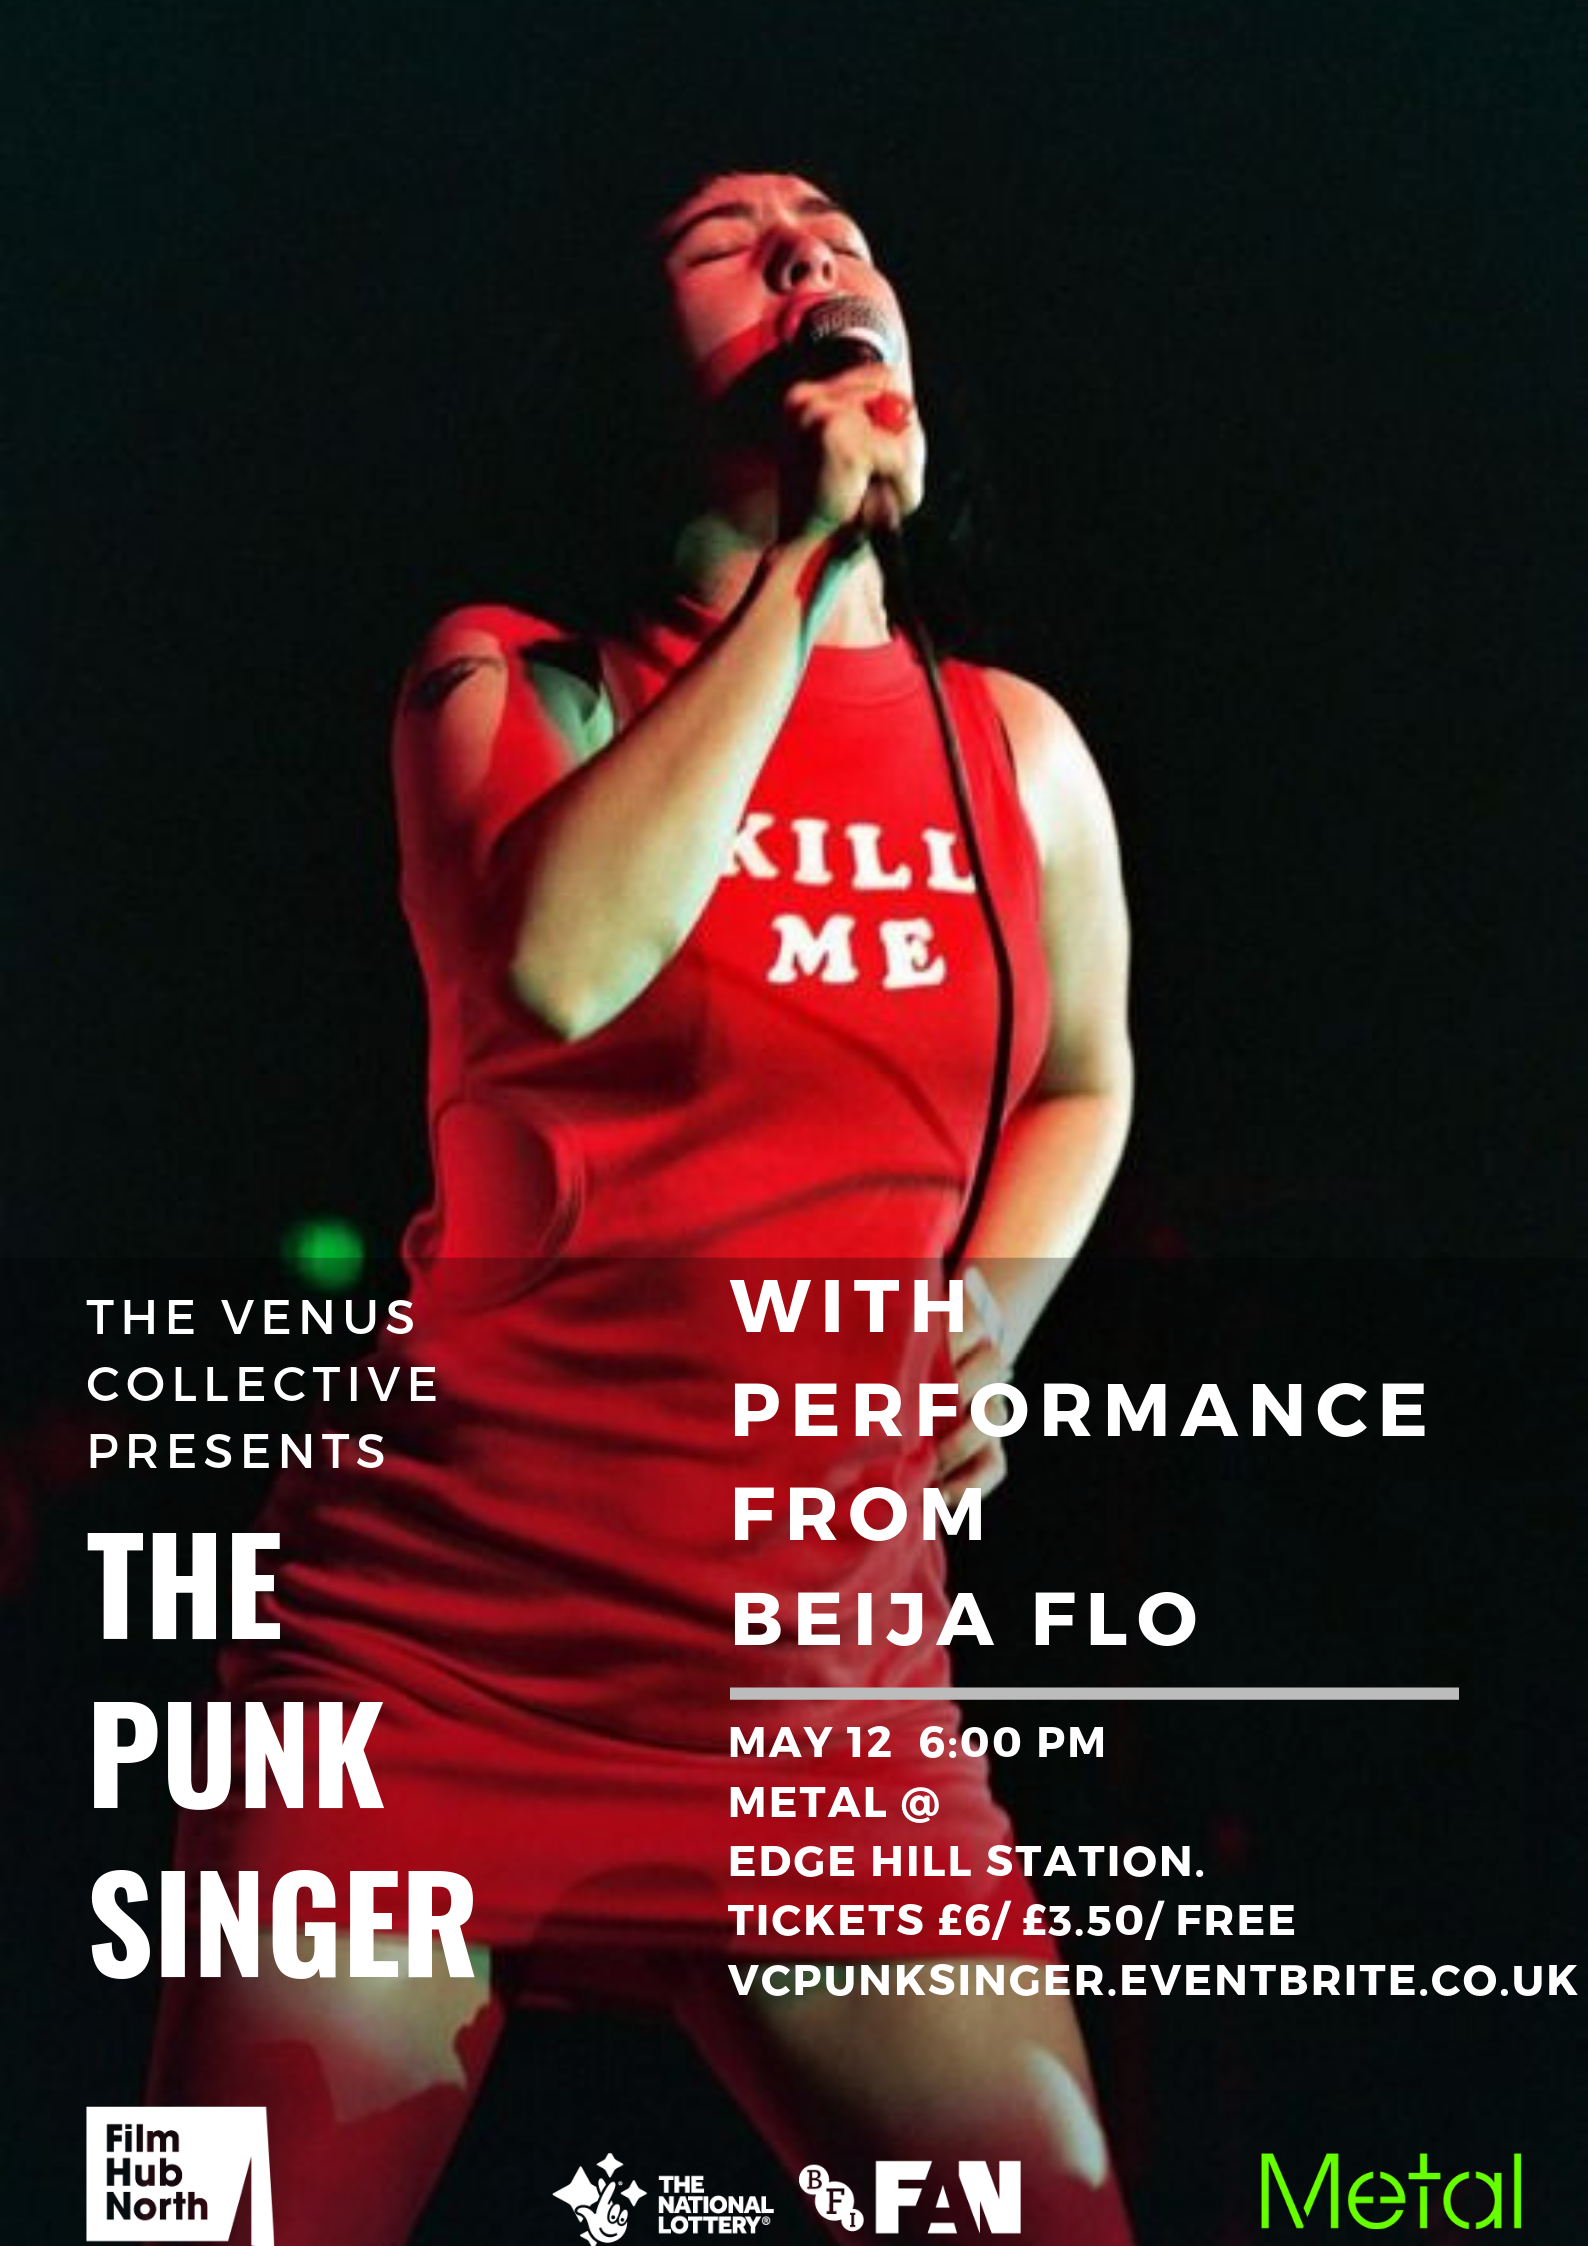 Metal: Venus Collective presents The Punk Singer